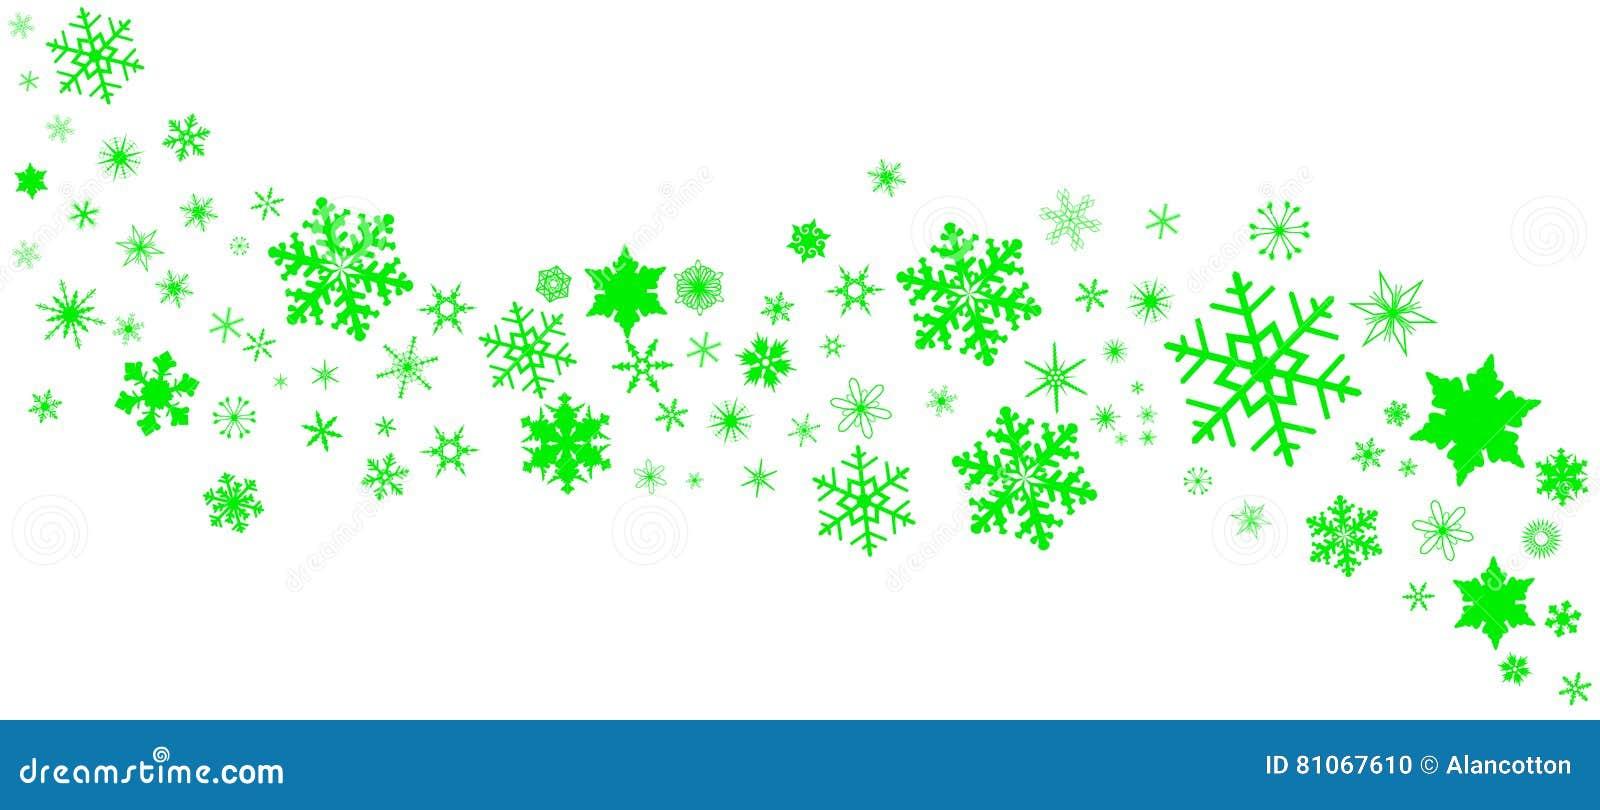 Green Christmas Snowflake Banner Stock Vector Illustration Of